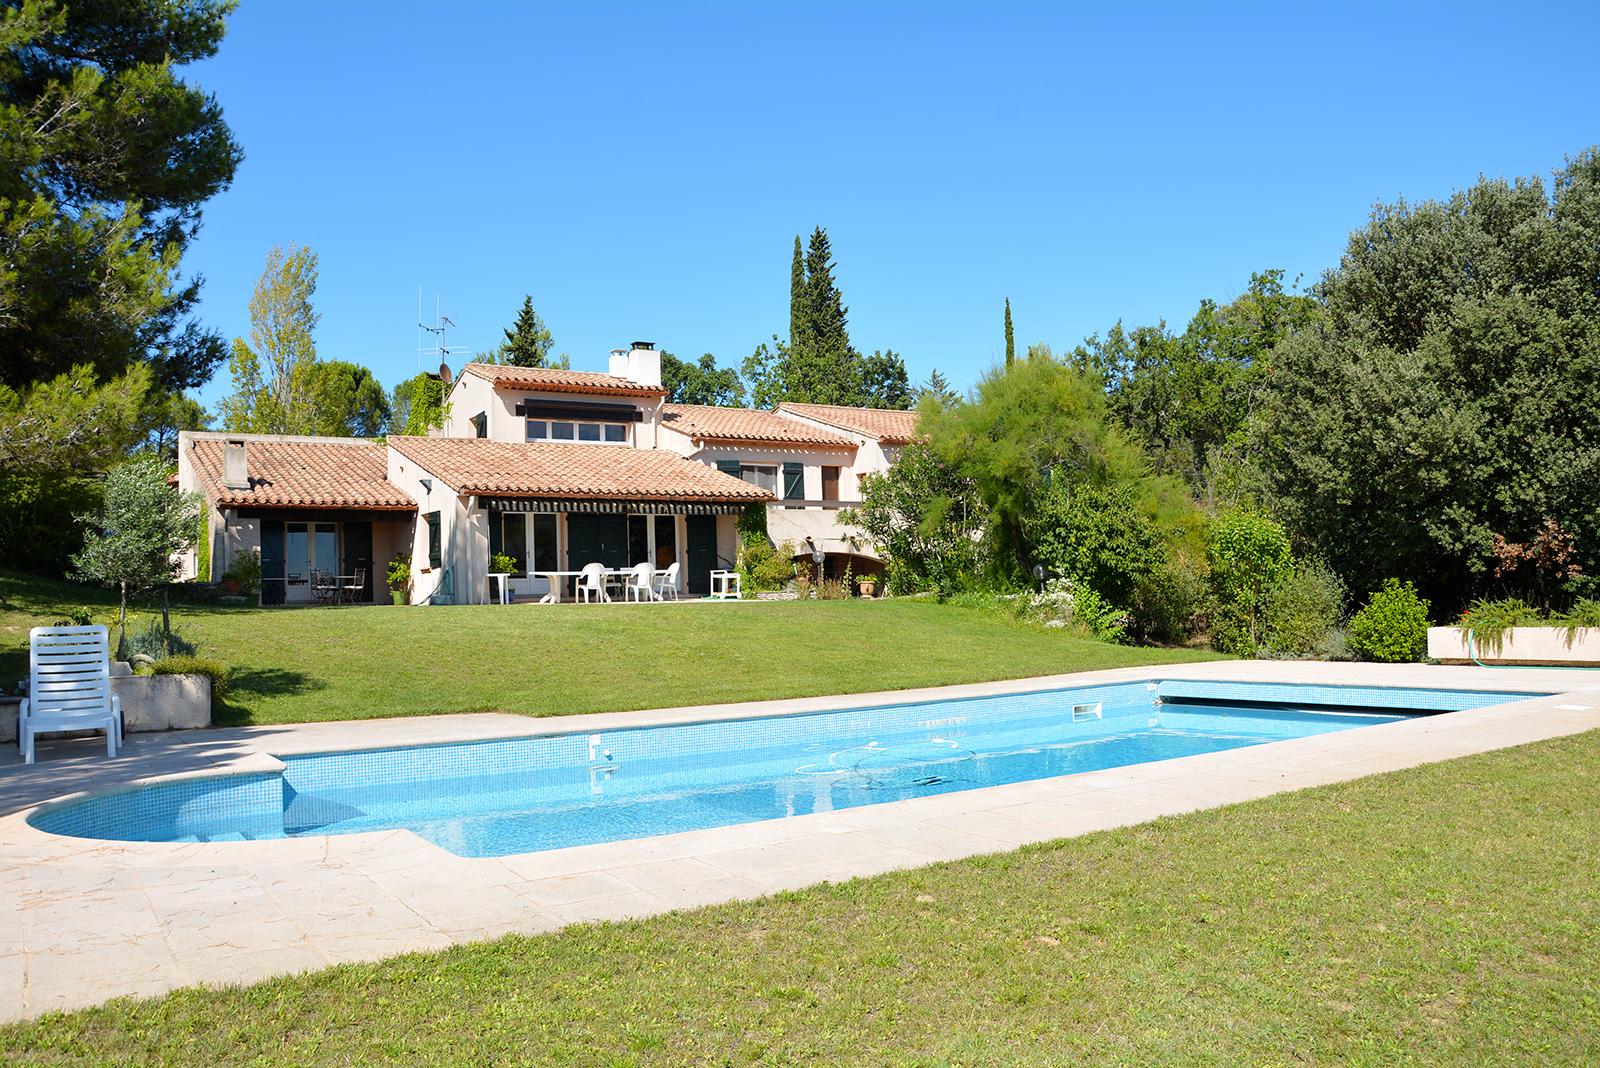 nestenn-villa-a-vendre-piscine-proche-carcassonne-01